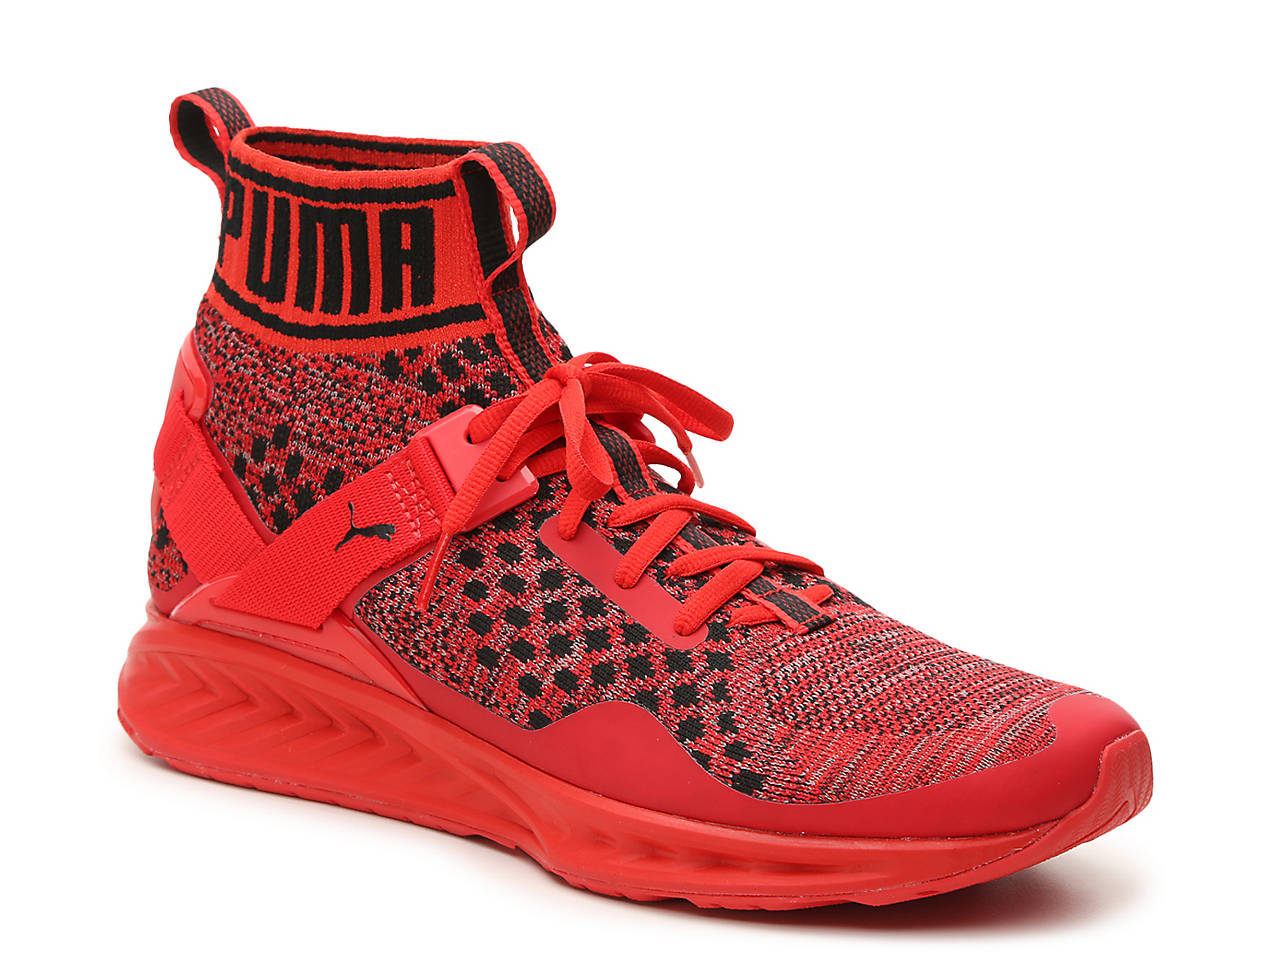 new style 89c94 316e6 Ignite EvoKnit High-Top Sneaker - Men's